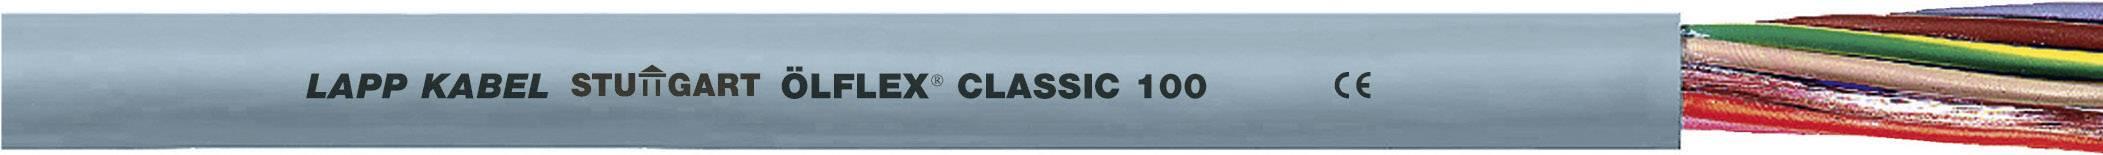 Kabel LappKabel Ölflex CLASSIC 100 5X0,75 (00101274), PVC, 6,7 mm, 500 V, šedá, 1000 m